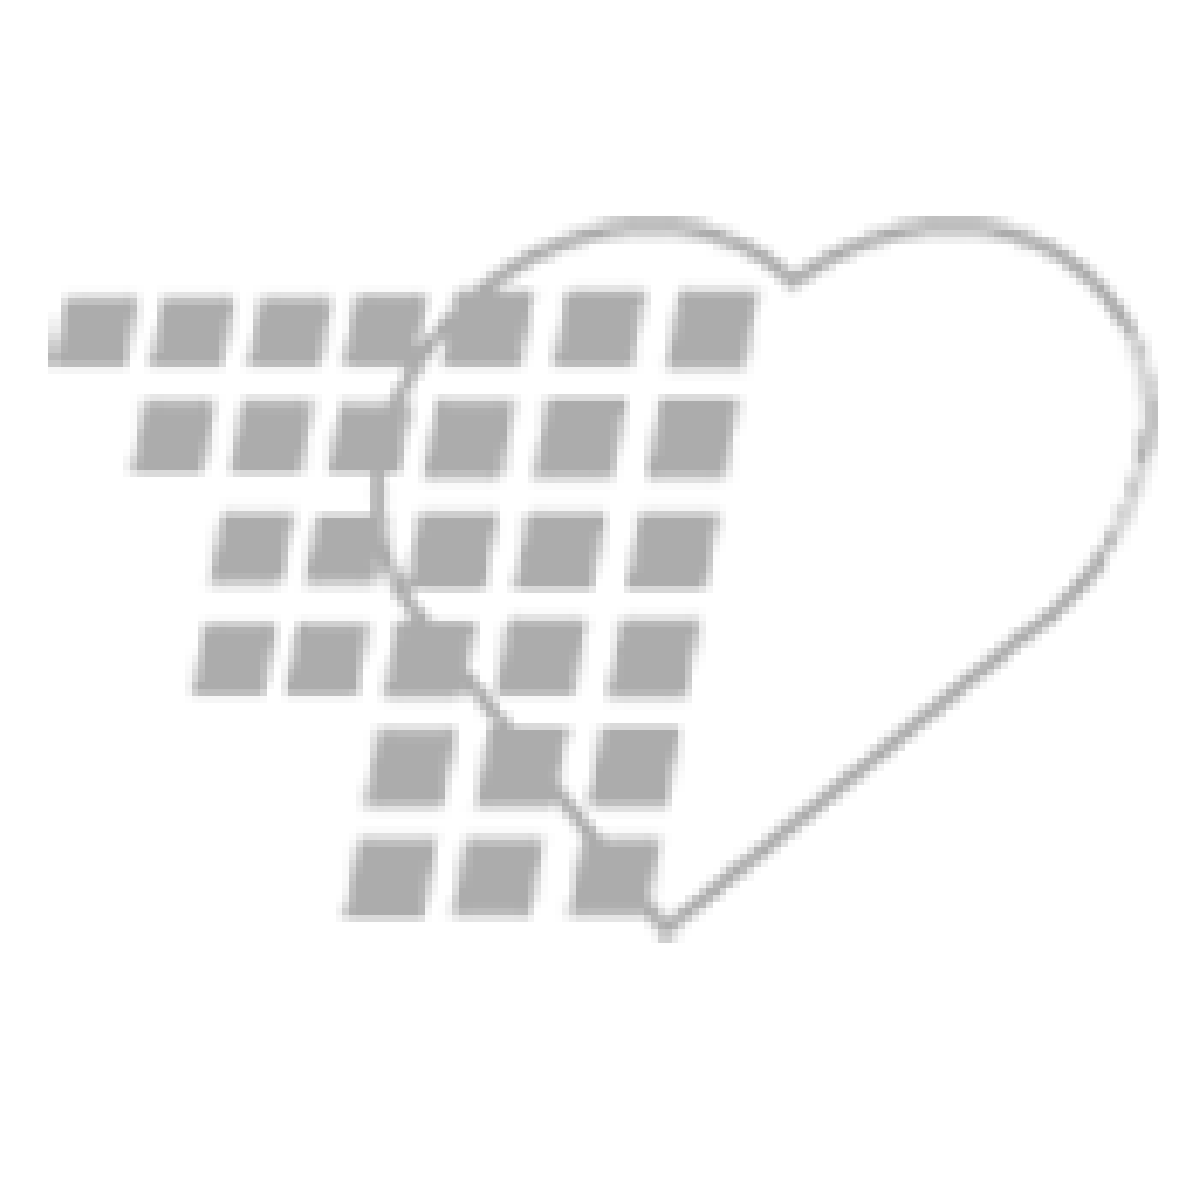 06-93-0046 Demo Dose® MetFORMN (Glucophag) 500 mg